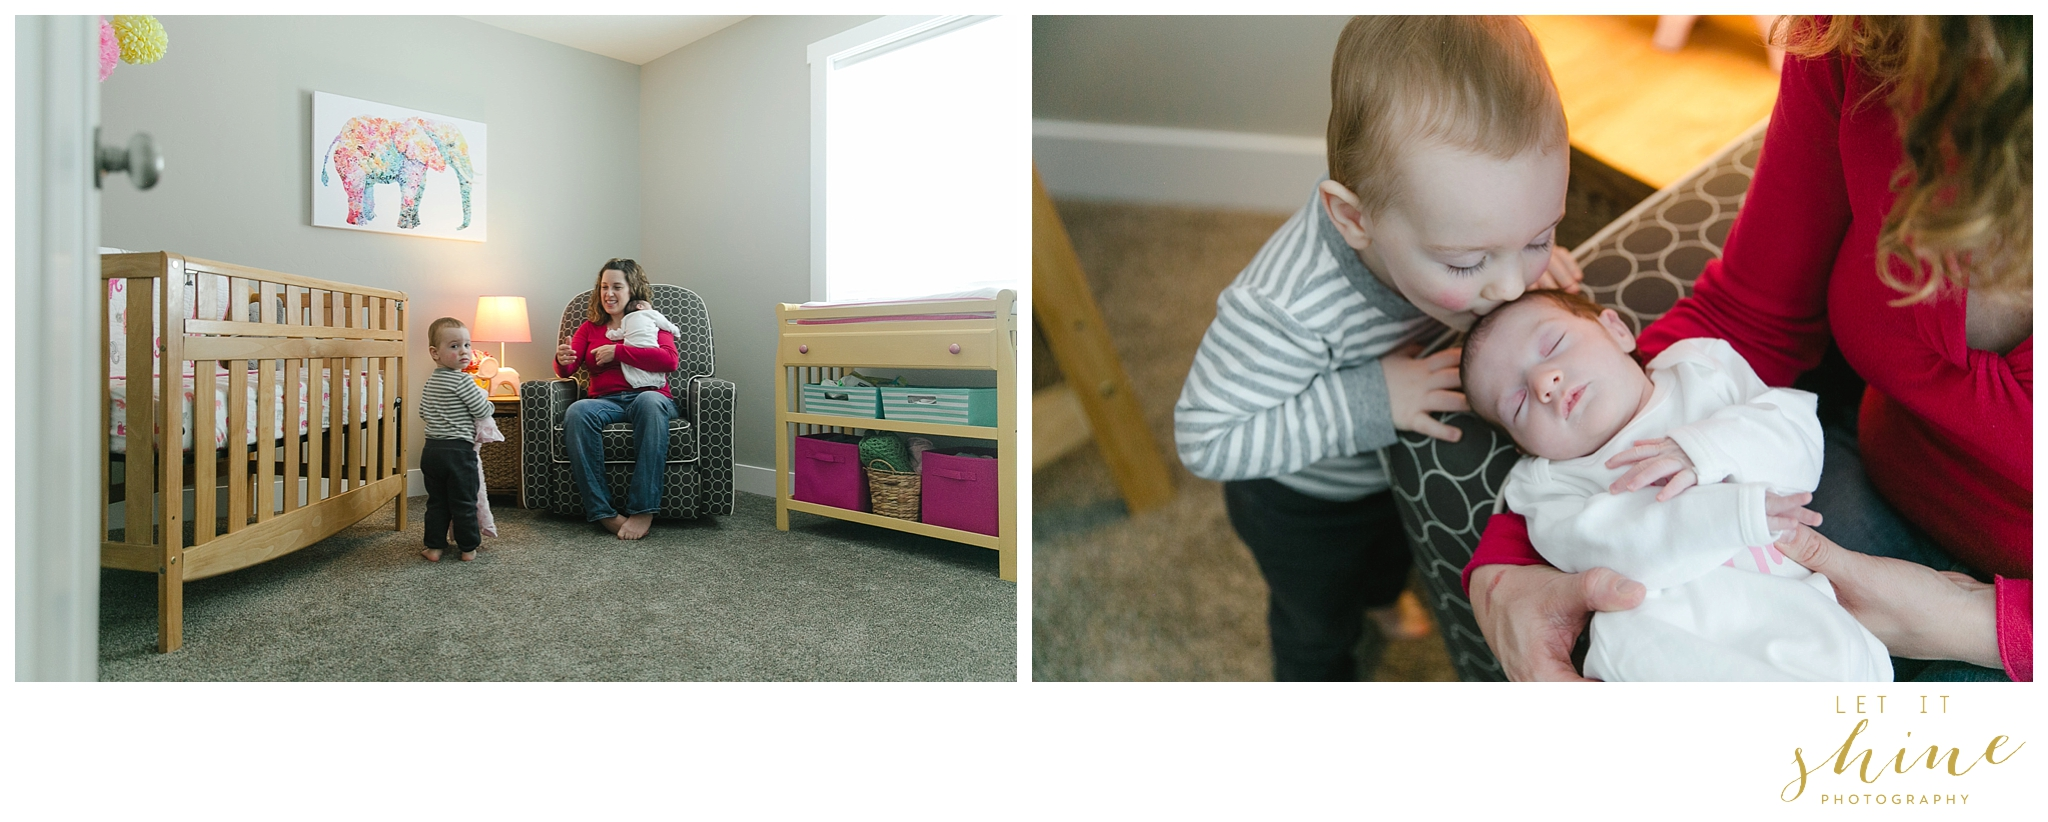 In Home Family Photographer Boise Idaho_0011.jpg